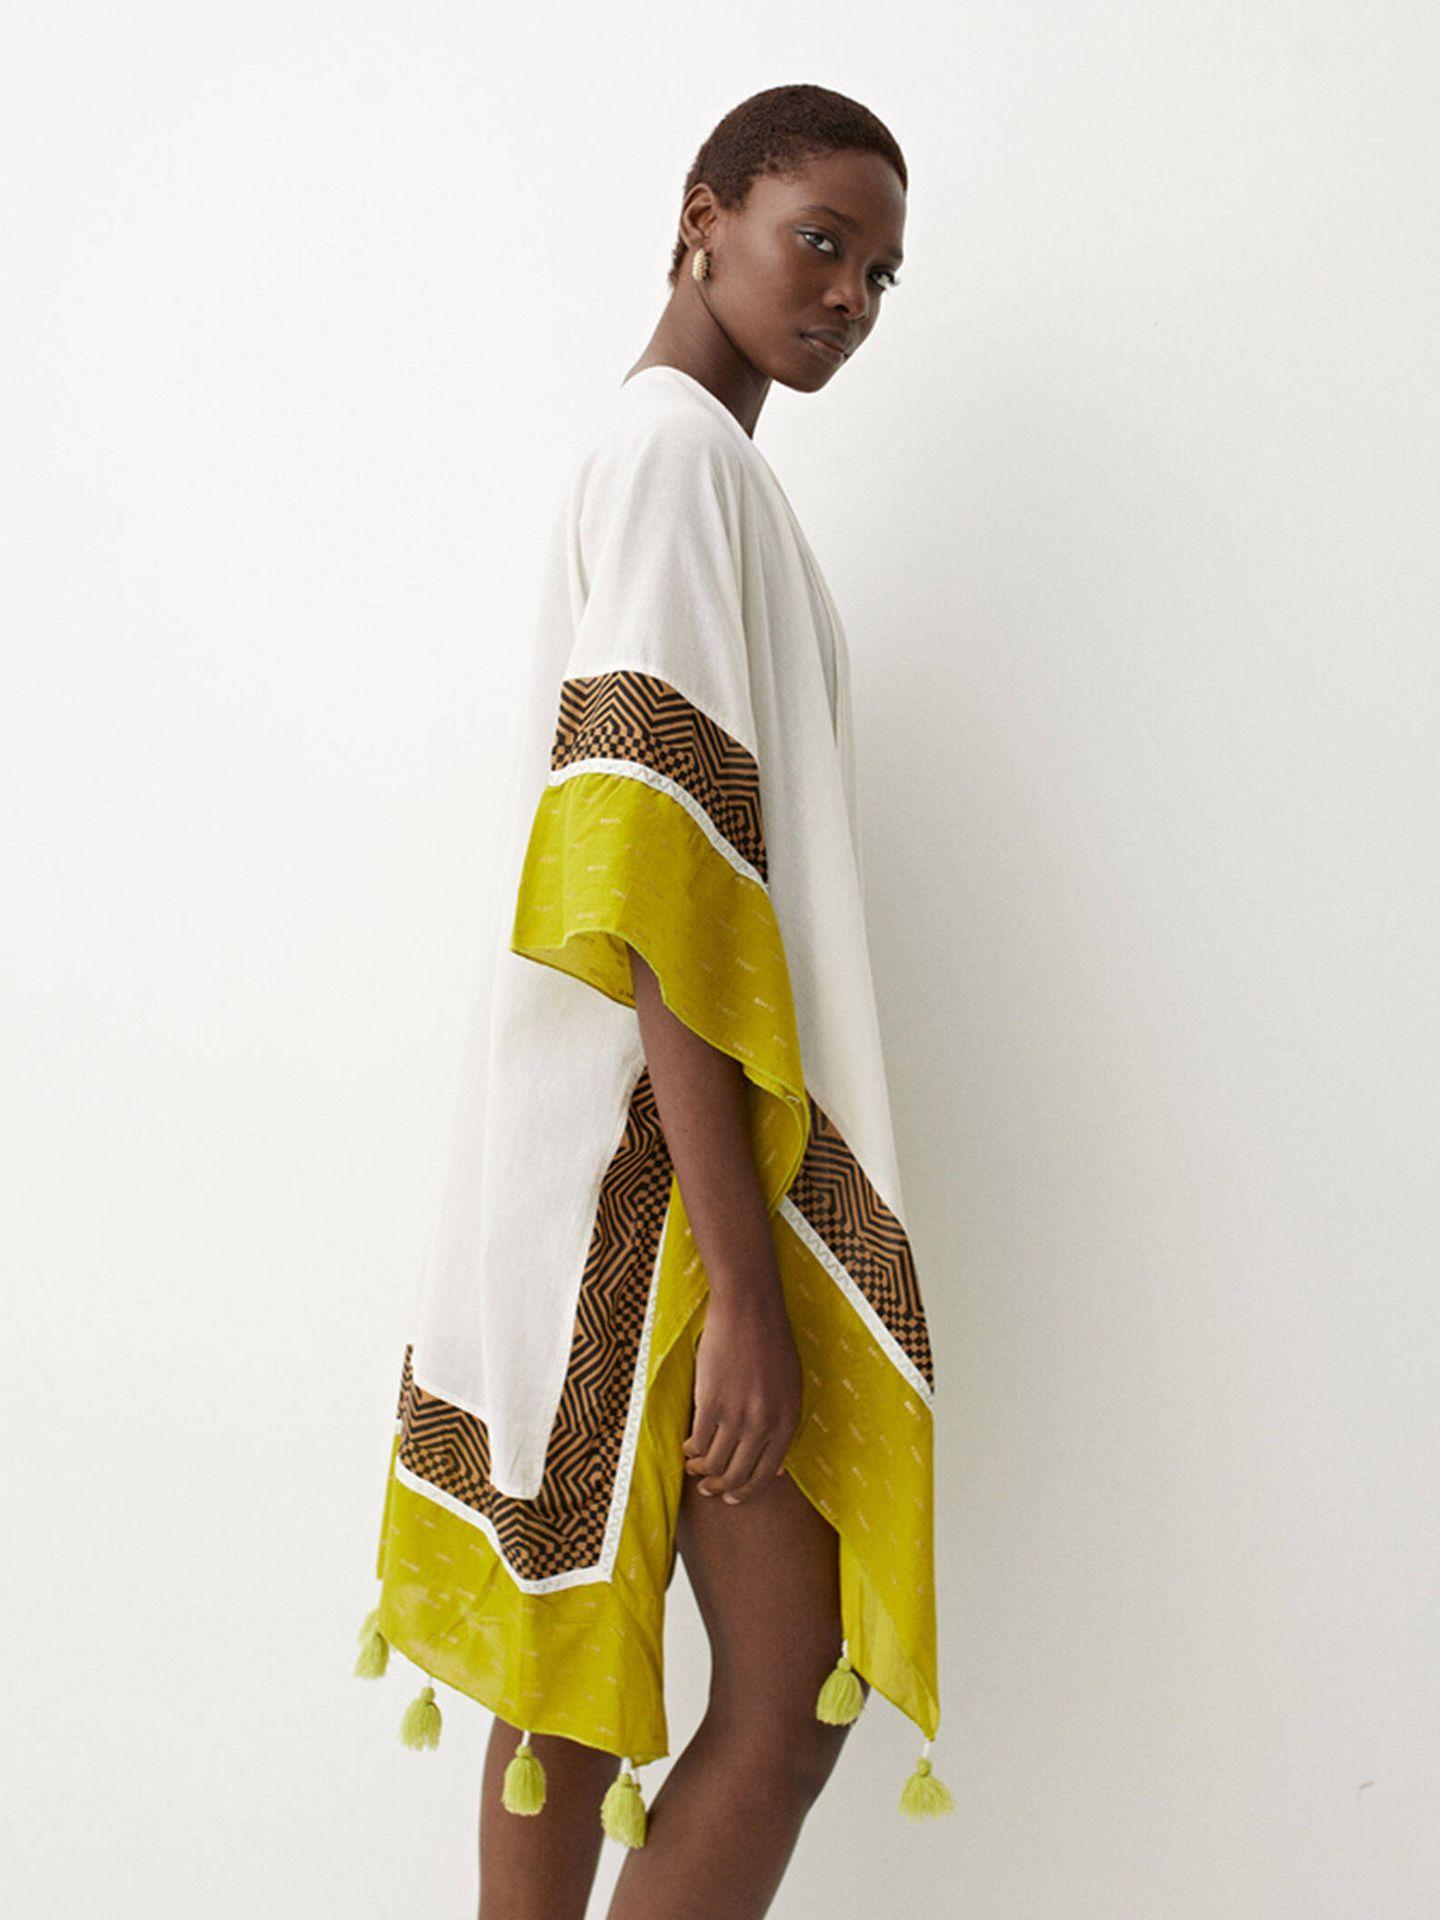 Kimono de Parfois para un verano con estilo. (Cortesía)